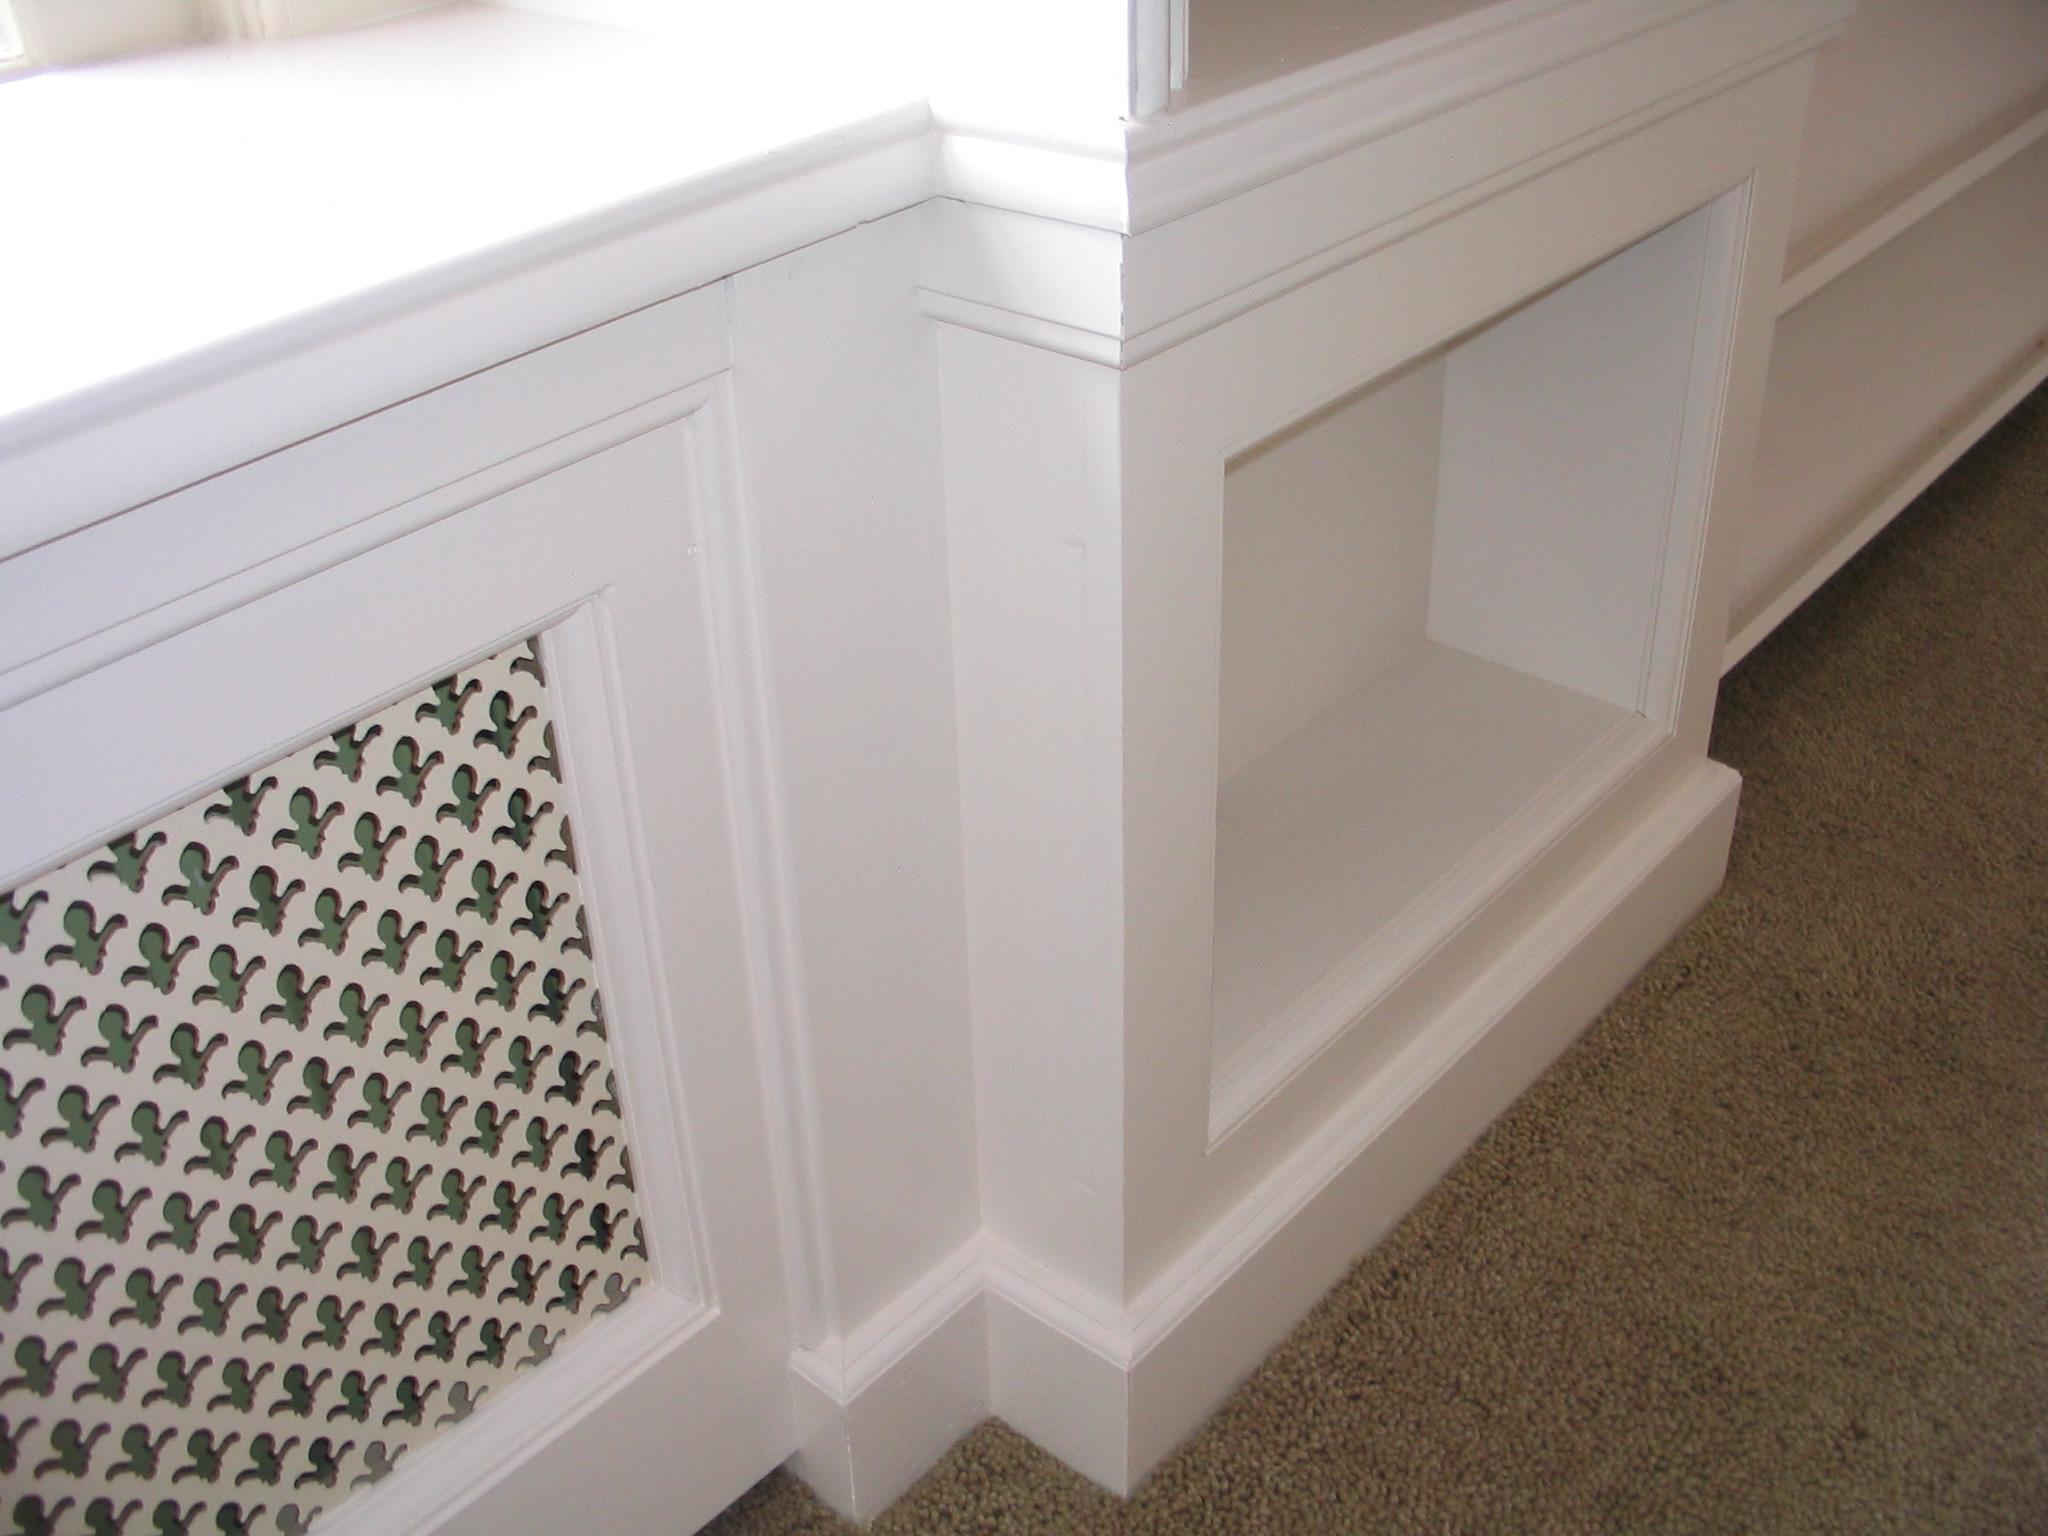 Deze radiatorkast is u00e9u00e9n geheel met de boekenkast en vensterbank. De ...